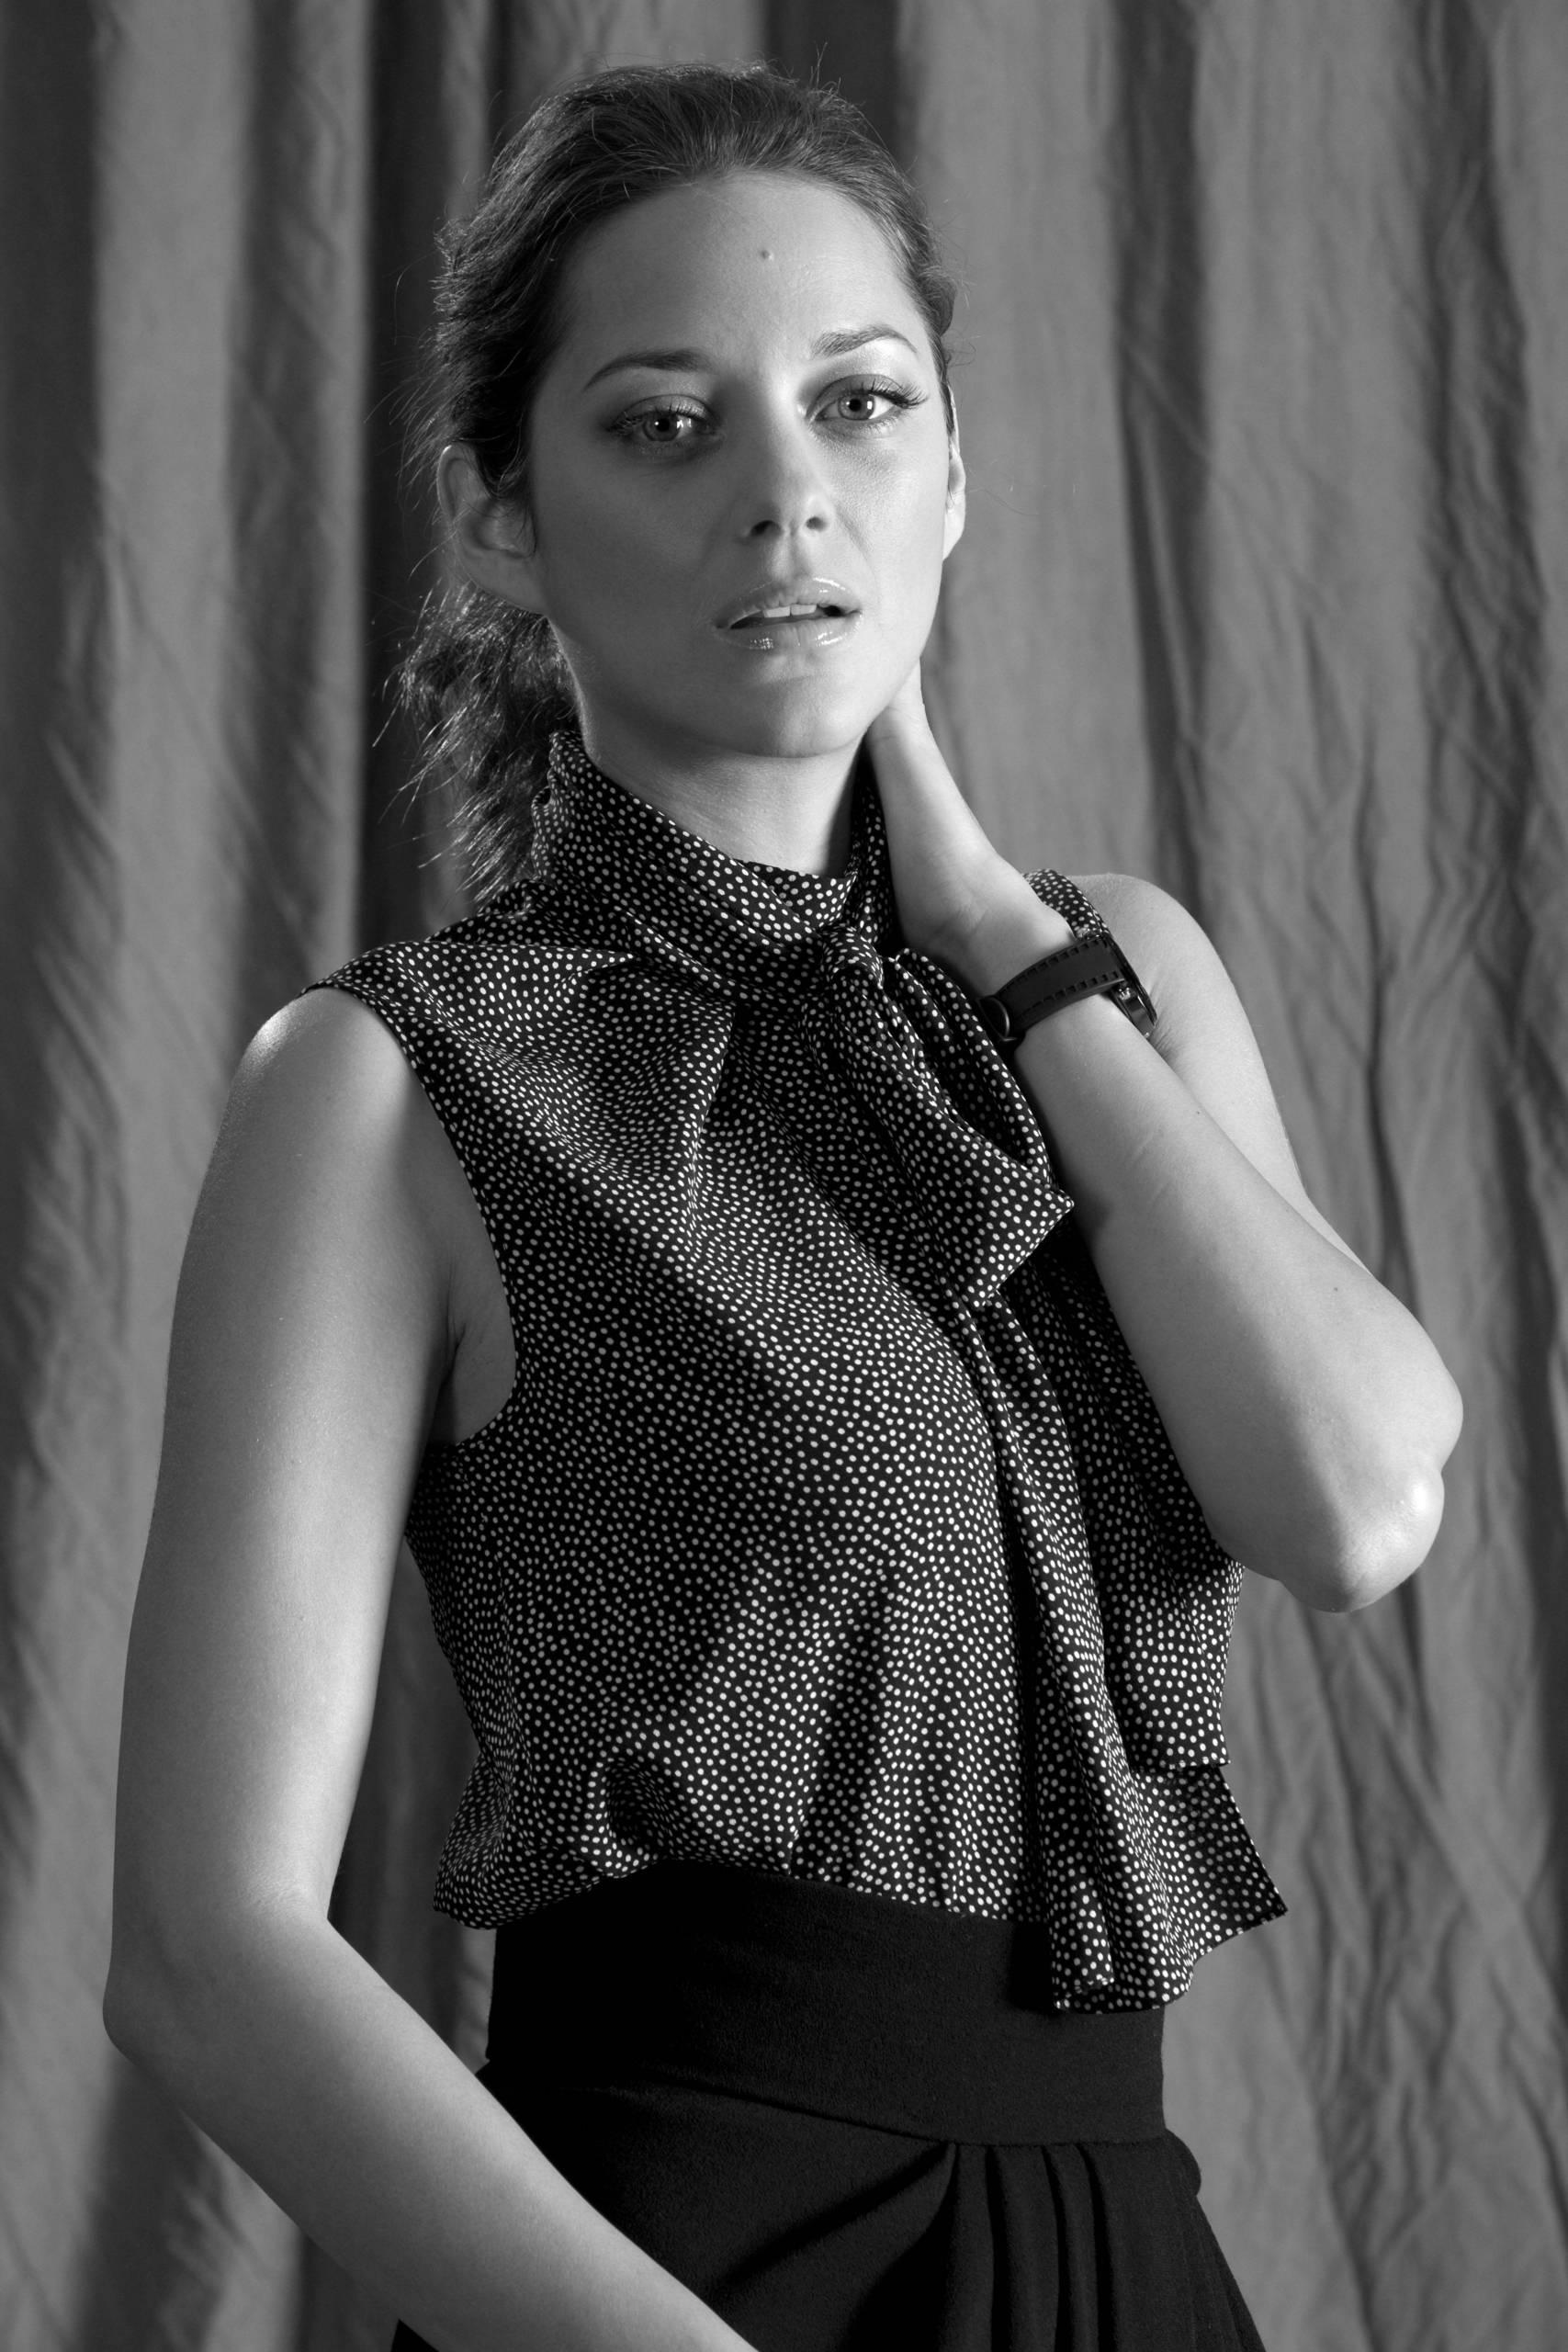 Marion Cotillard | Public Enemies Promotional Photoshoot ... Marion Cotillard